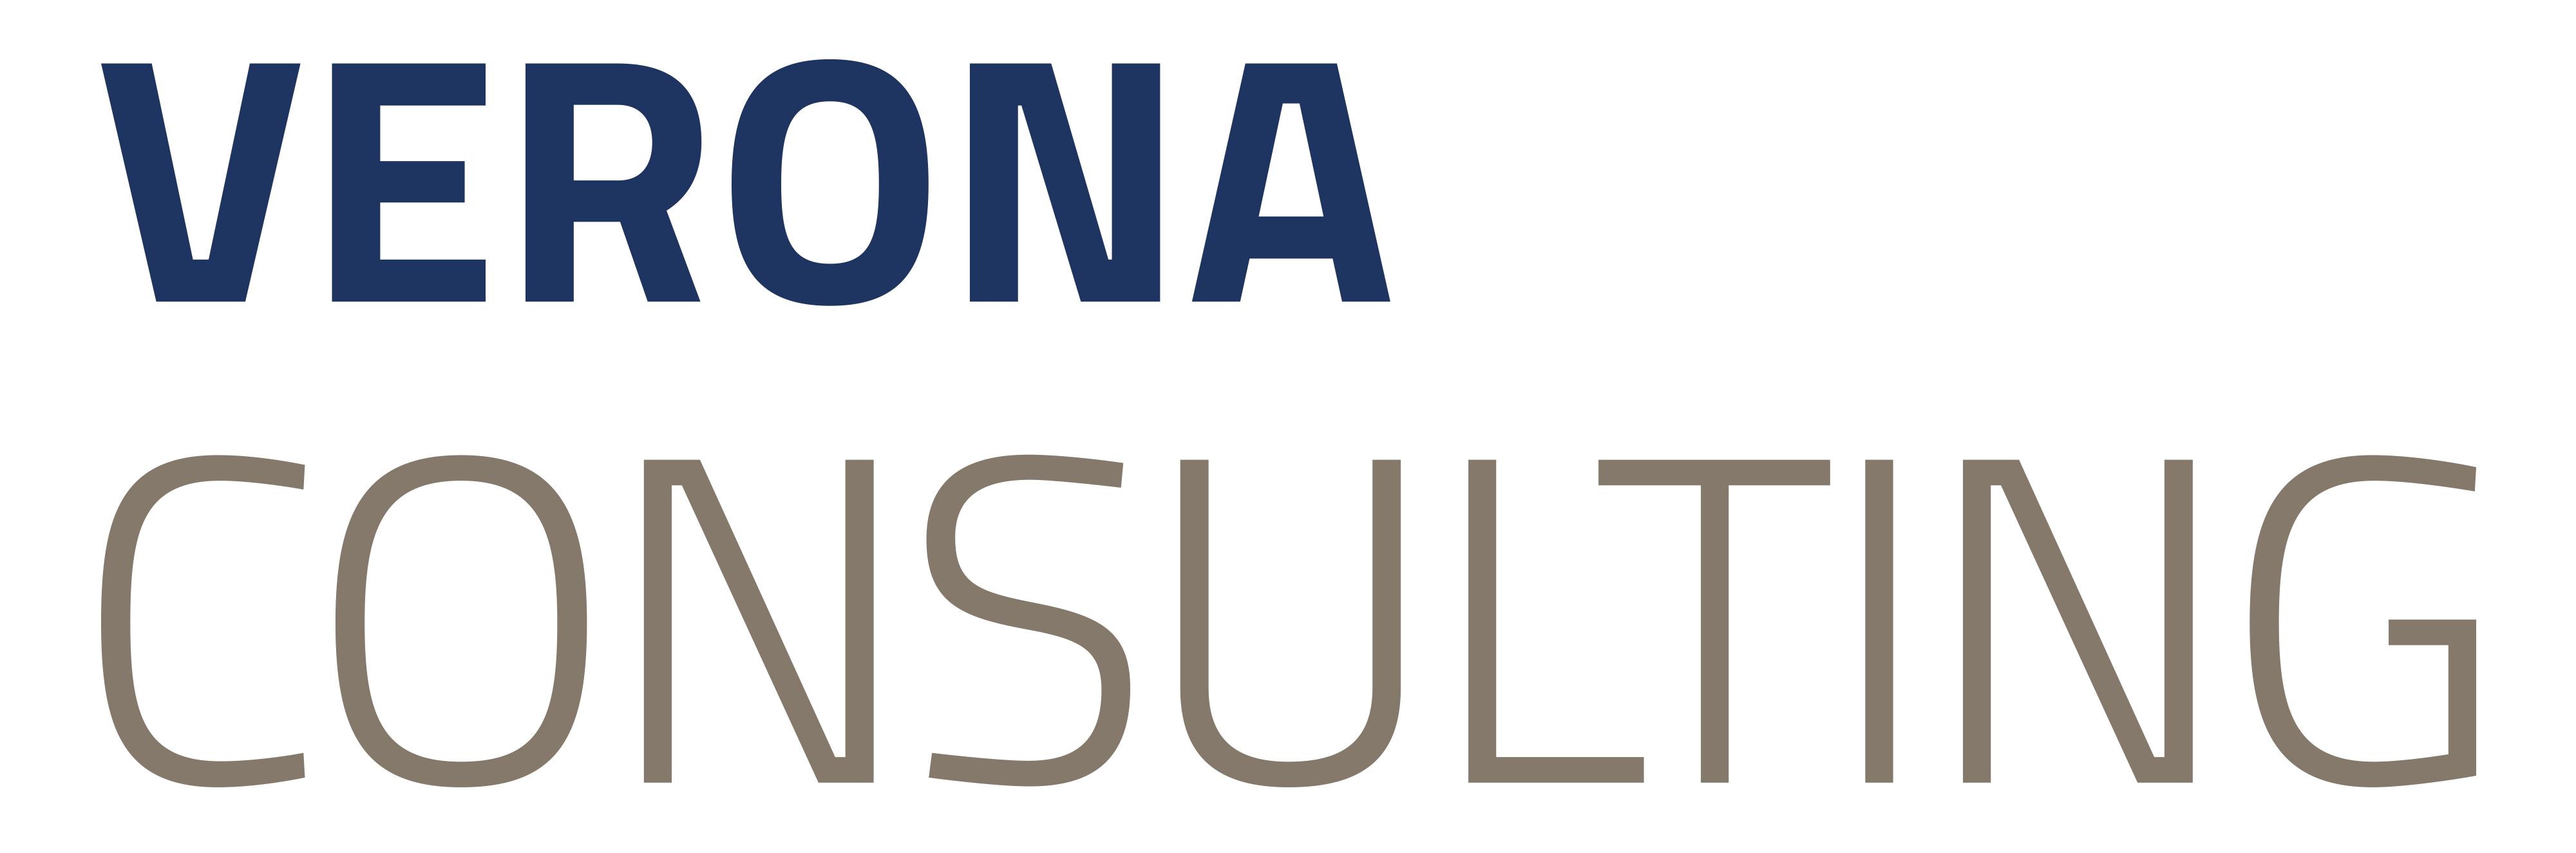 Verona Consulting Oy